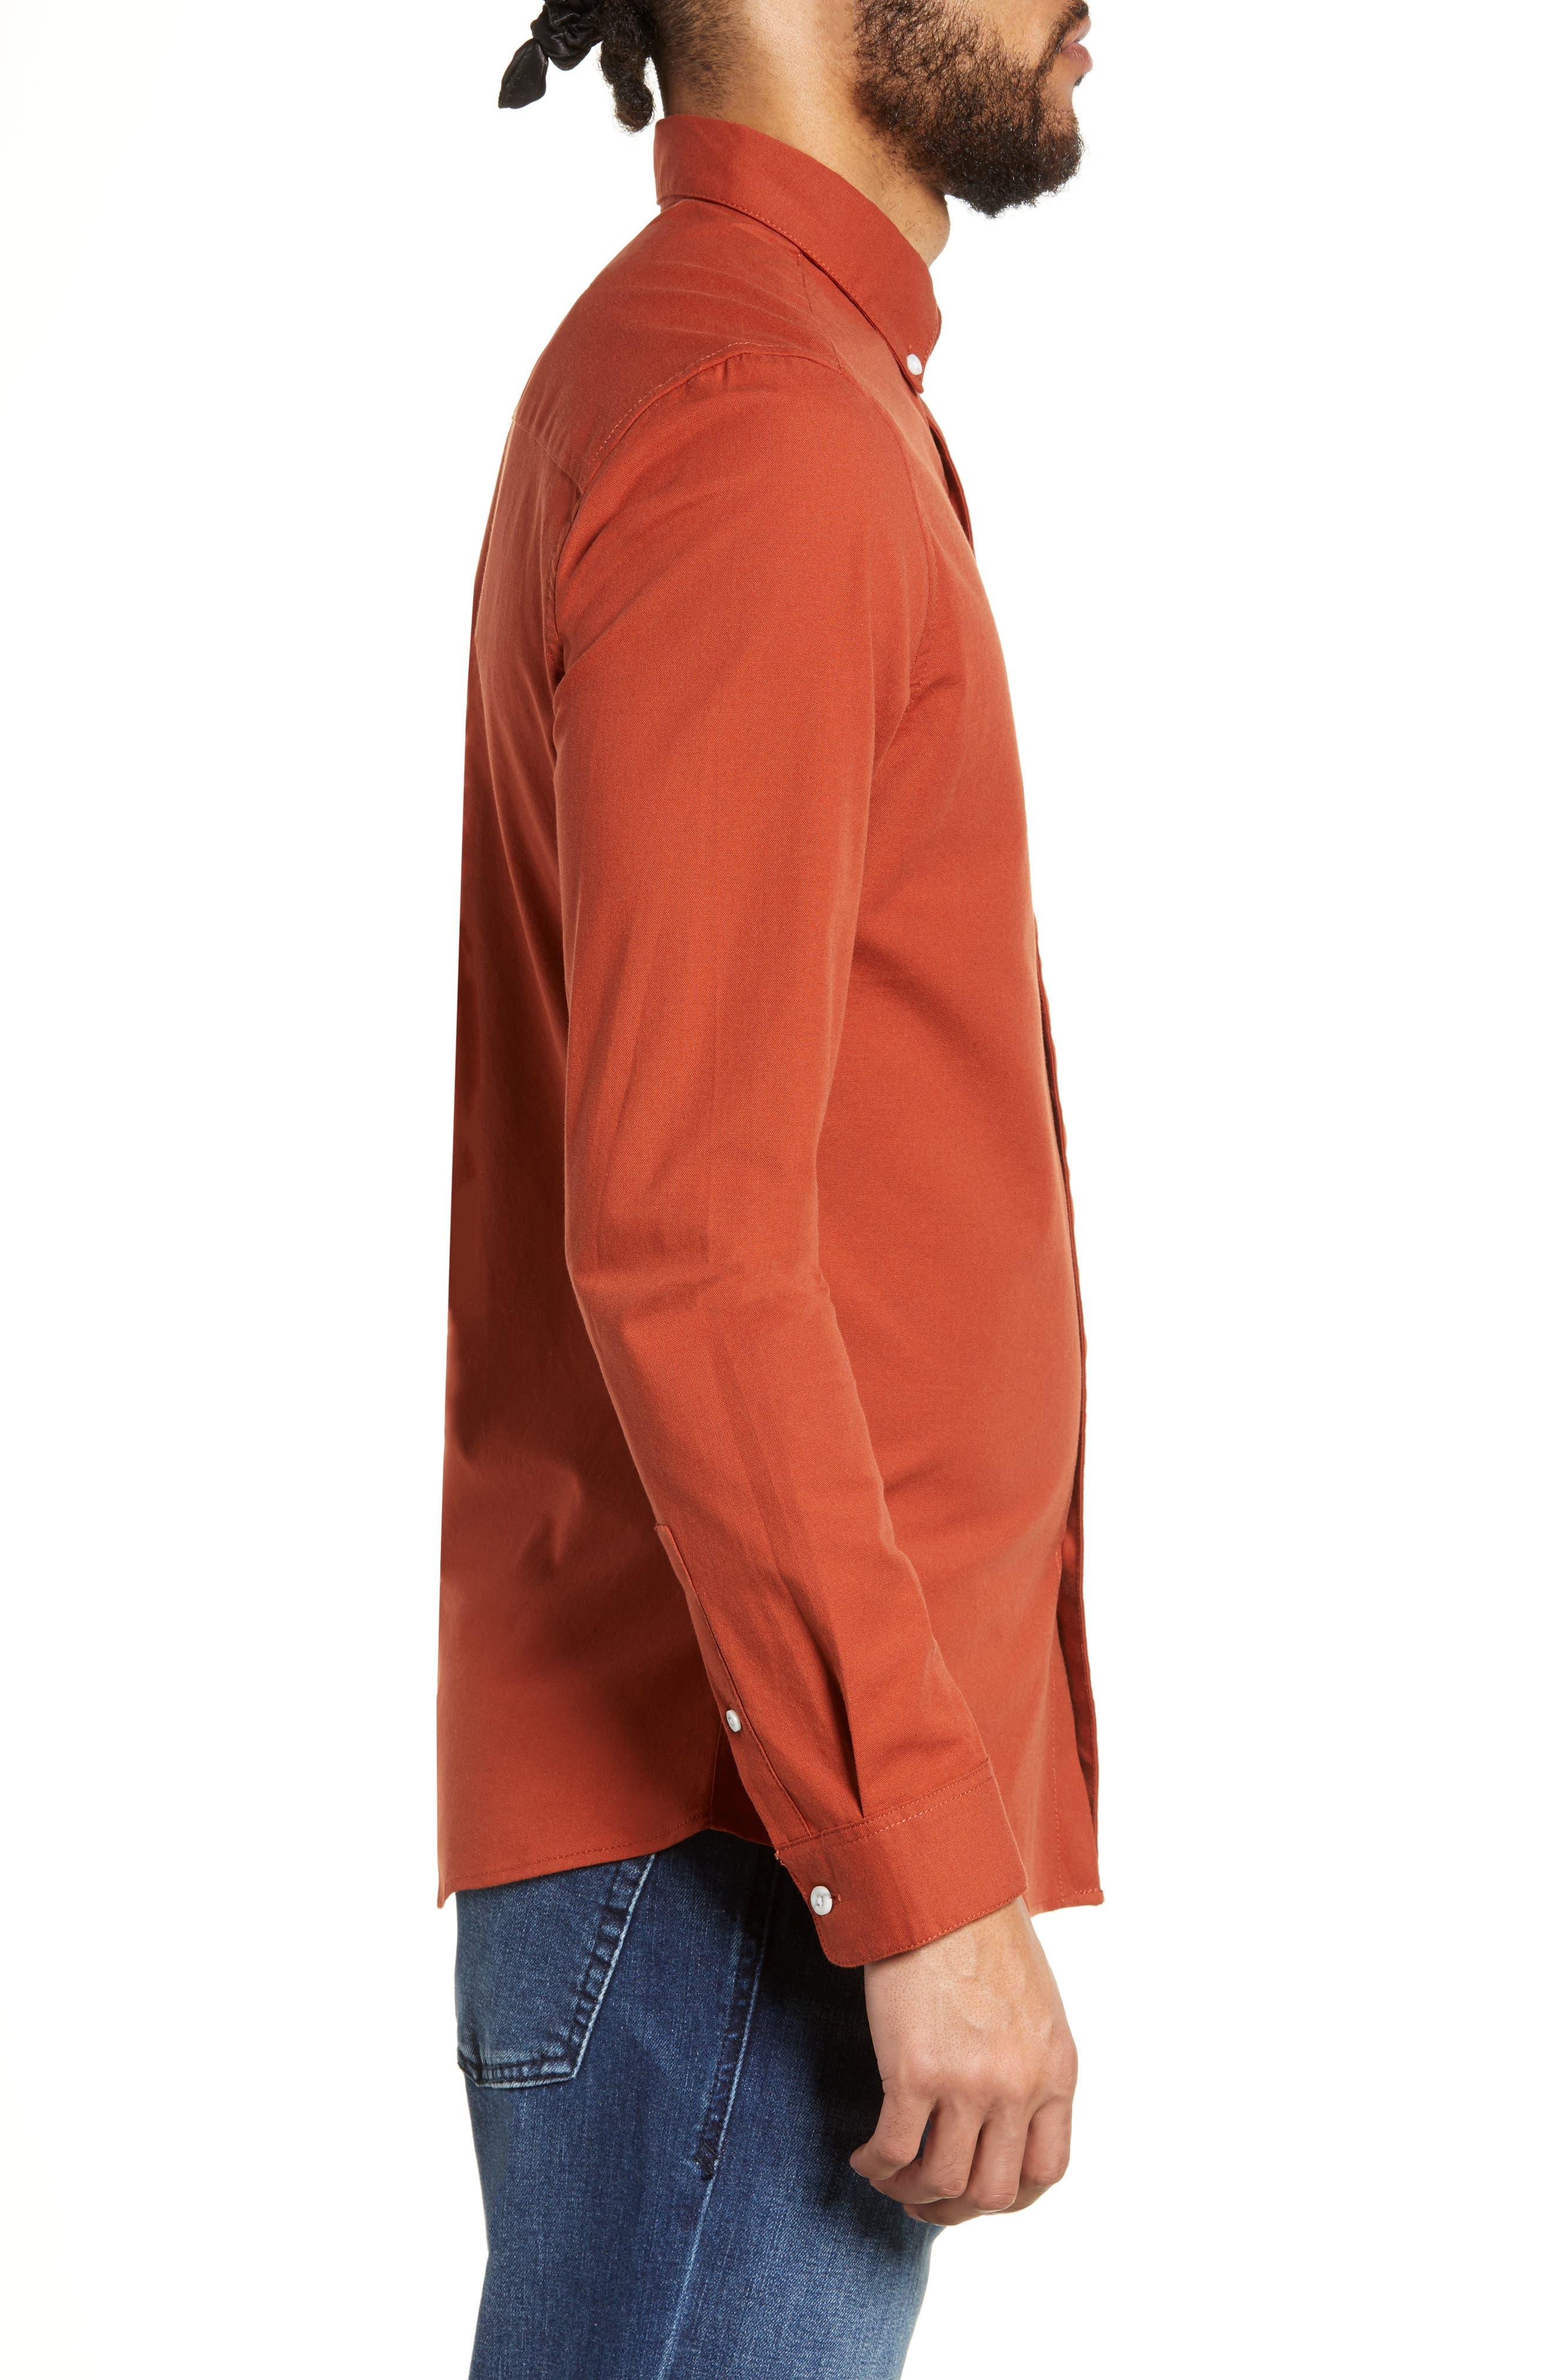 TOPMAN,                             Classic Fit Oxford Shirt,                             Alternate thumbnail 4, color,                             BROWN